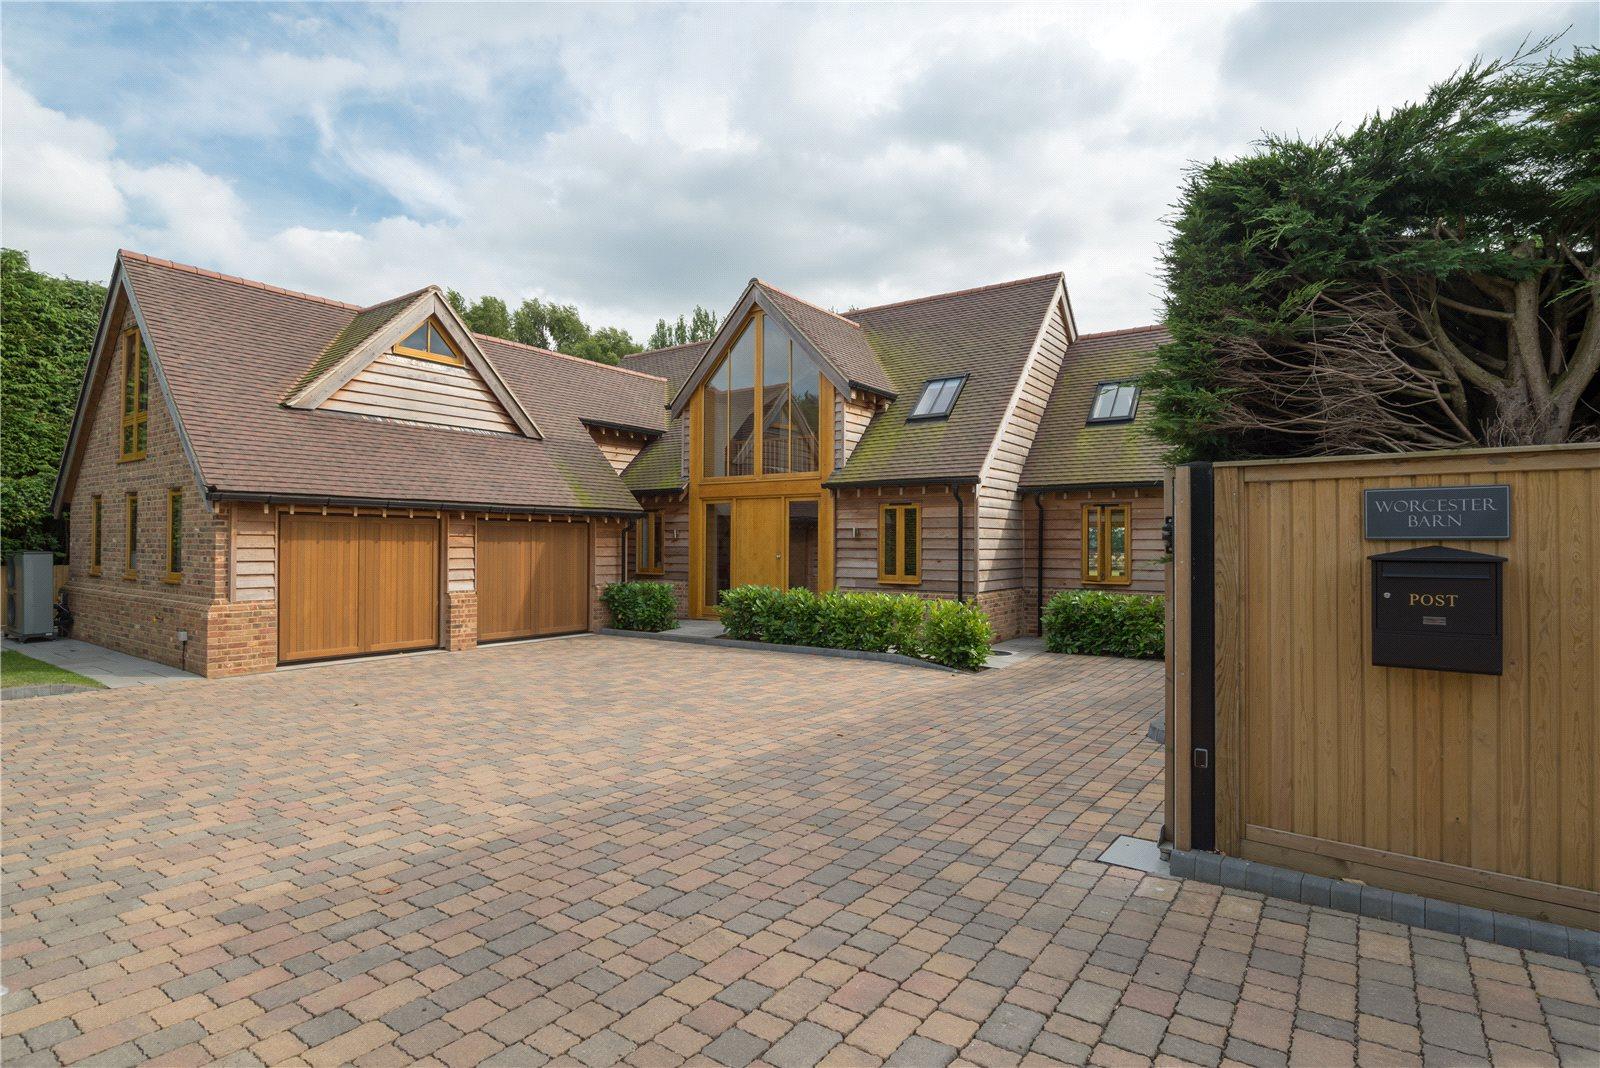 Tek Ailelik Ev için Satış at Worcester Lane, Canterbury, Kent, CT3 Canterbury, Ingiltere